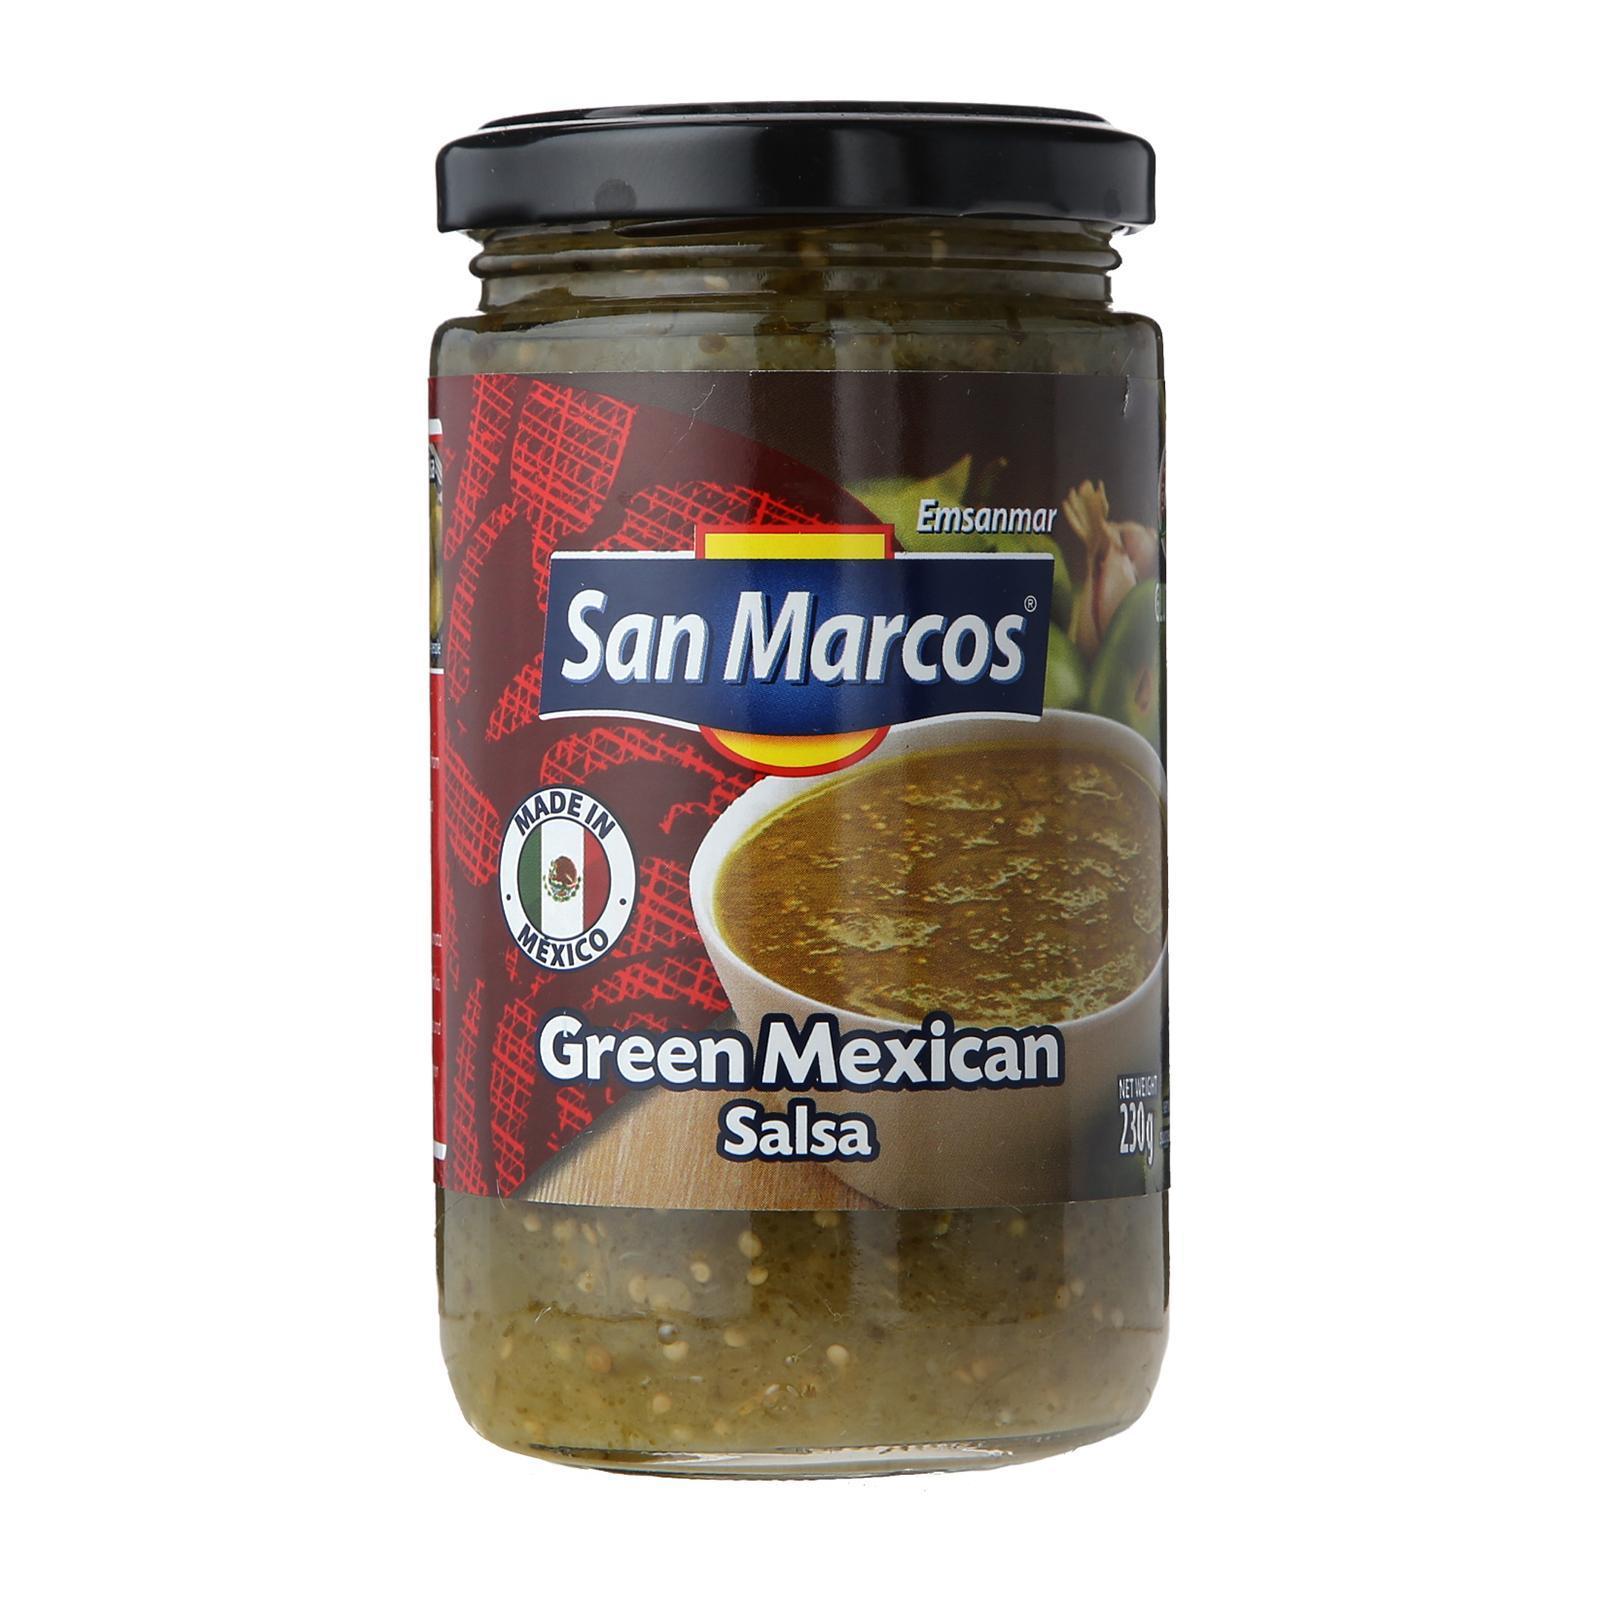 San Marcos Green Mexican Salsa